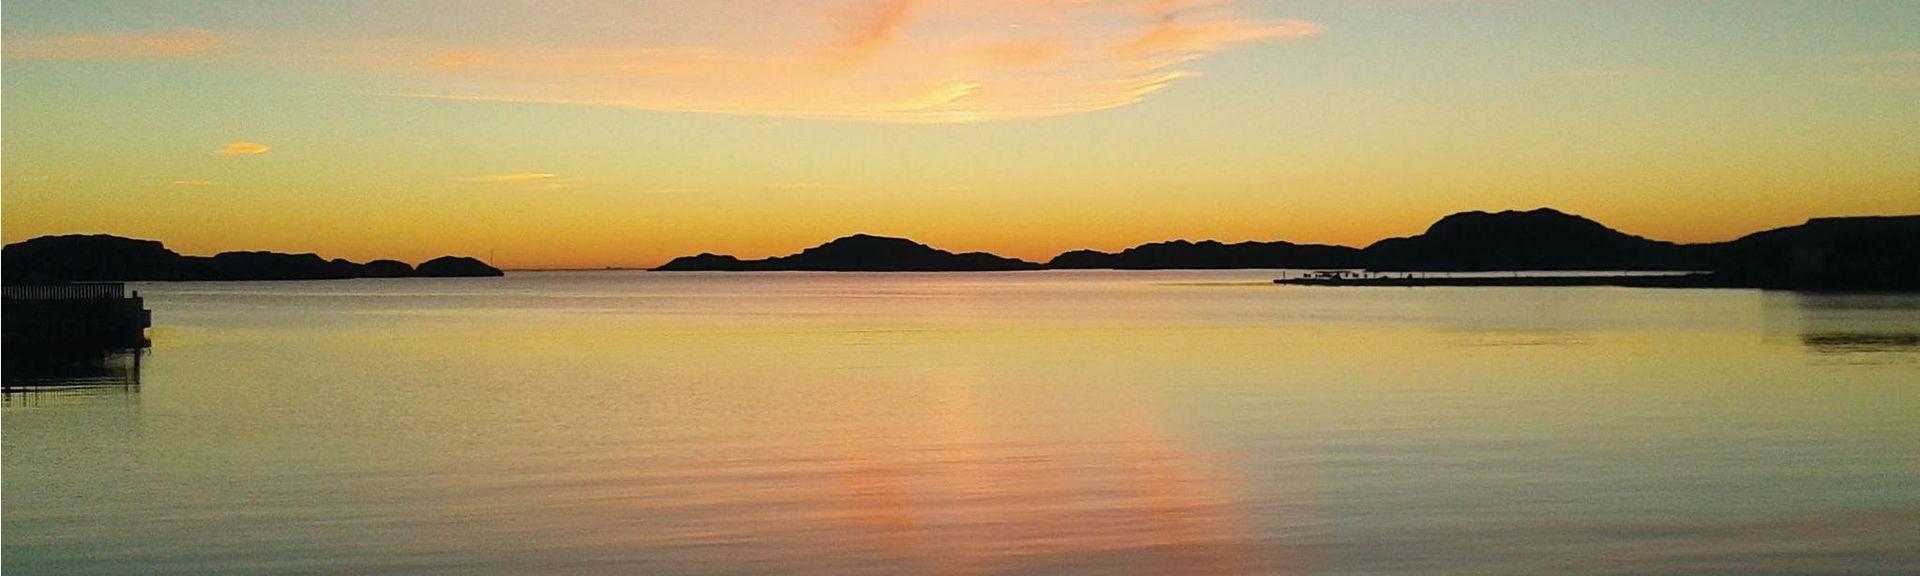 Rönnäng, Roennaeng, Vastra Gotaland County, Sweden